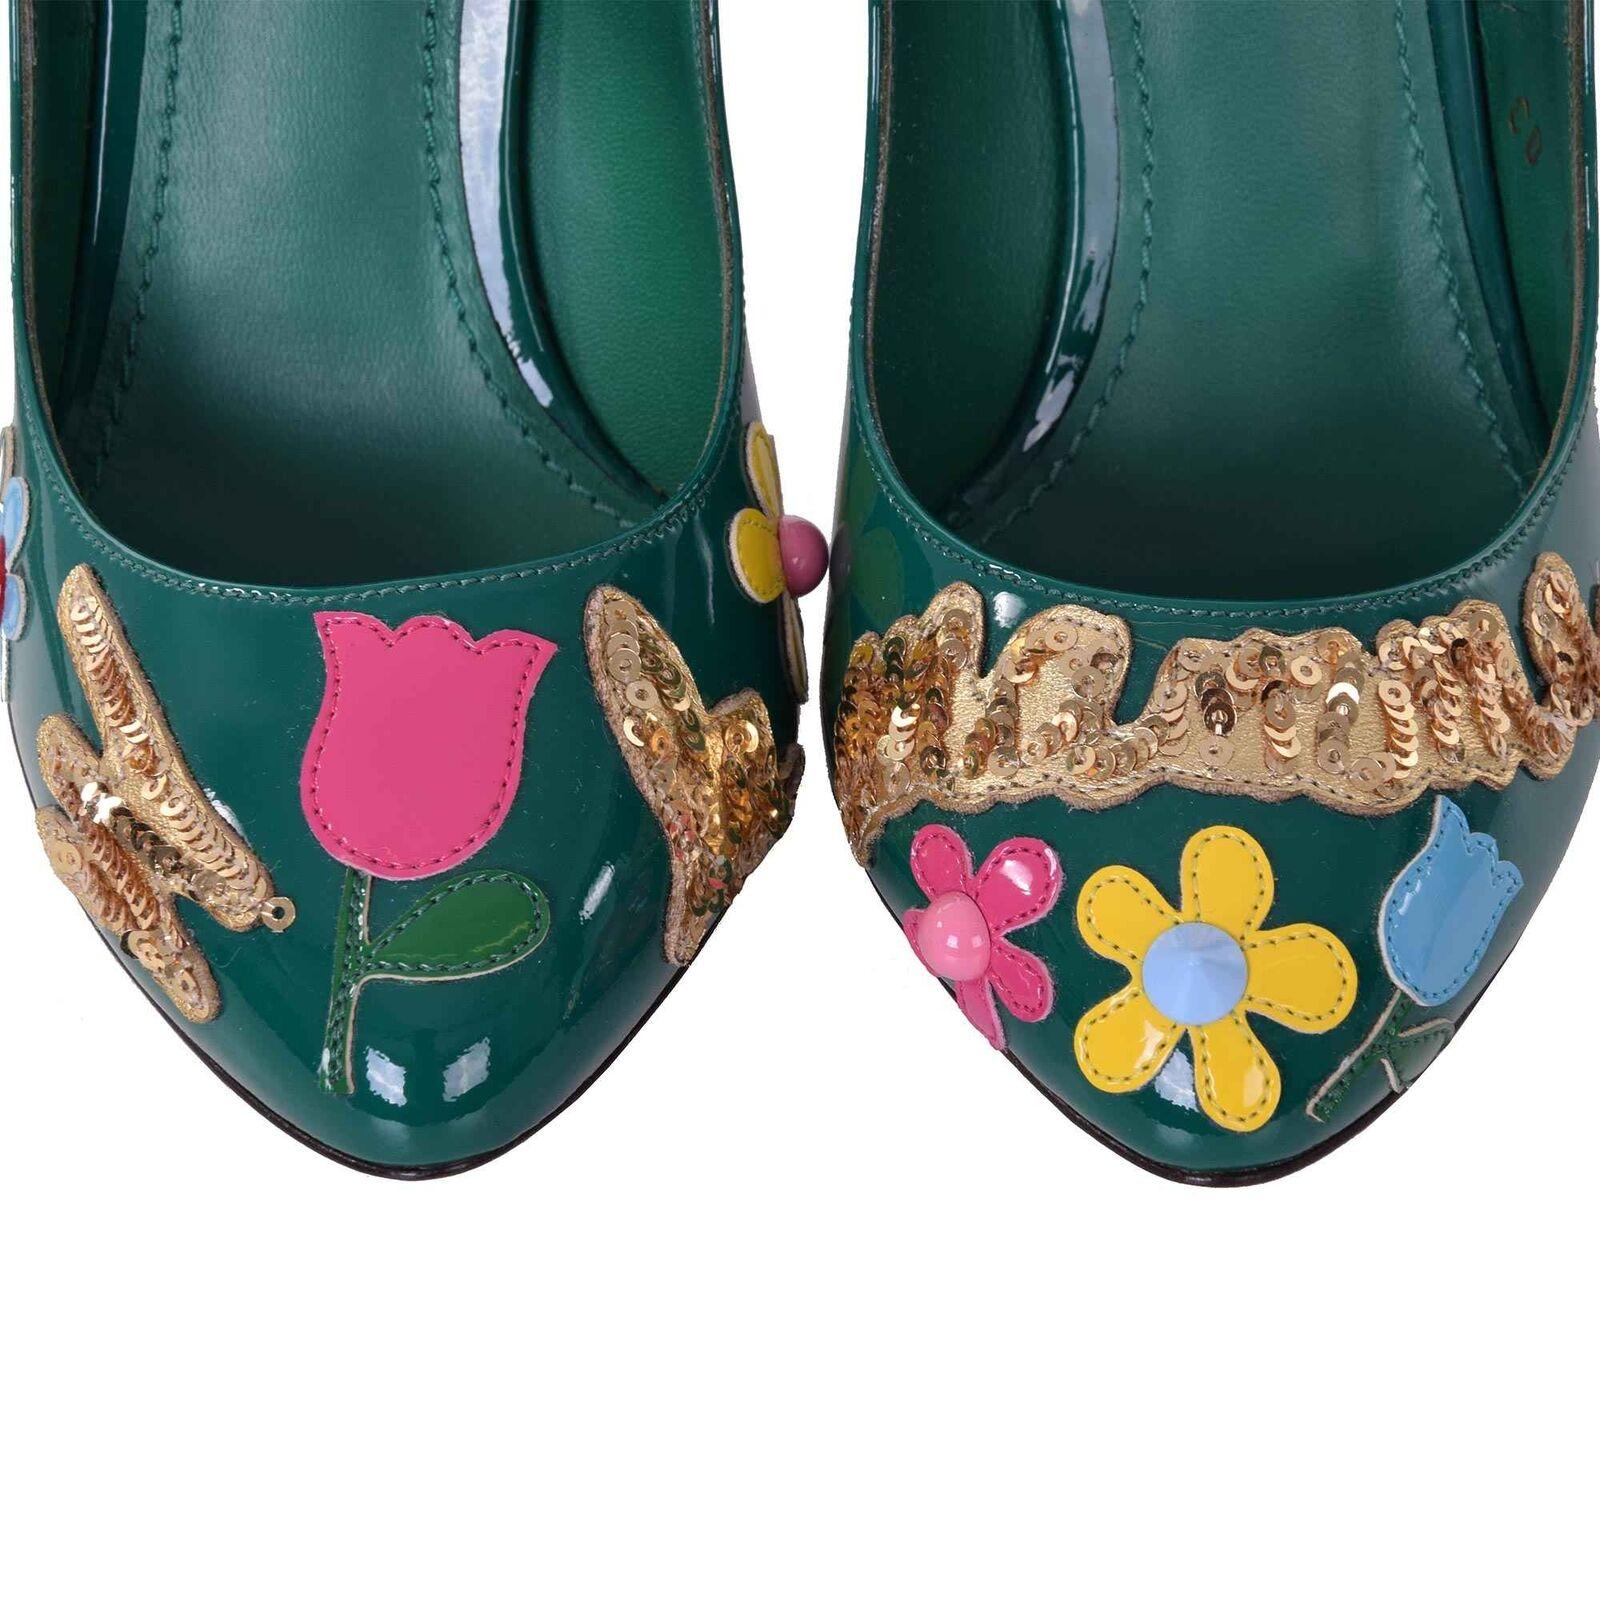 DOLCE & GABBANA Lackleder Mary Mary Mary Jane Pumps Schuhe Blumen Applikationen Grün 06761 f70517